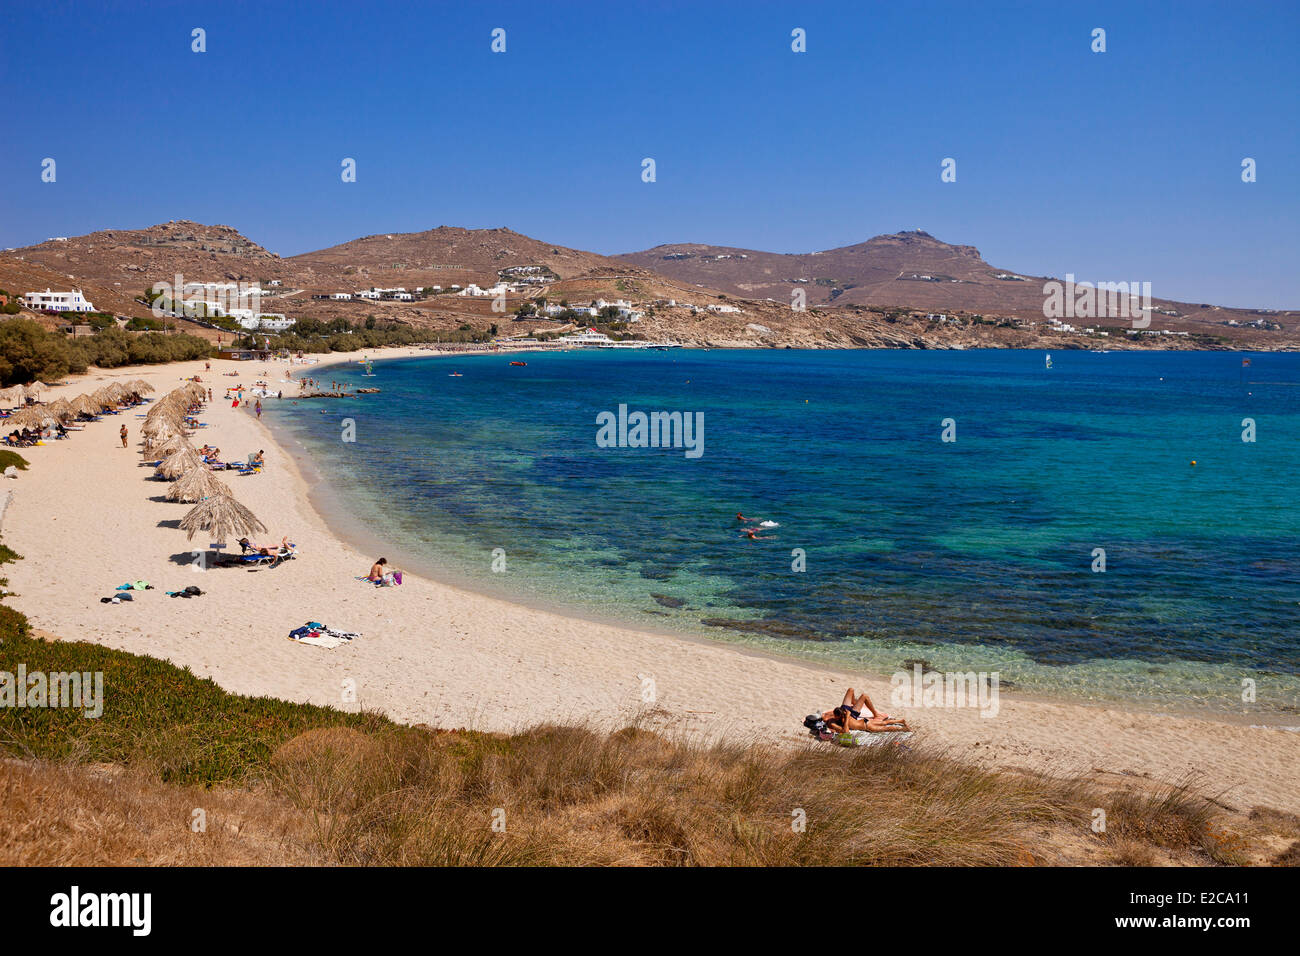 Grecia CICLADI MYKONOS Isola, Spiaggia di Kalafatis Immagini Stock